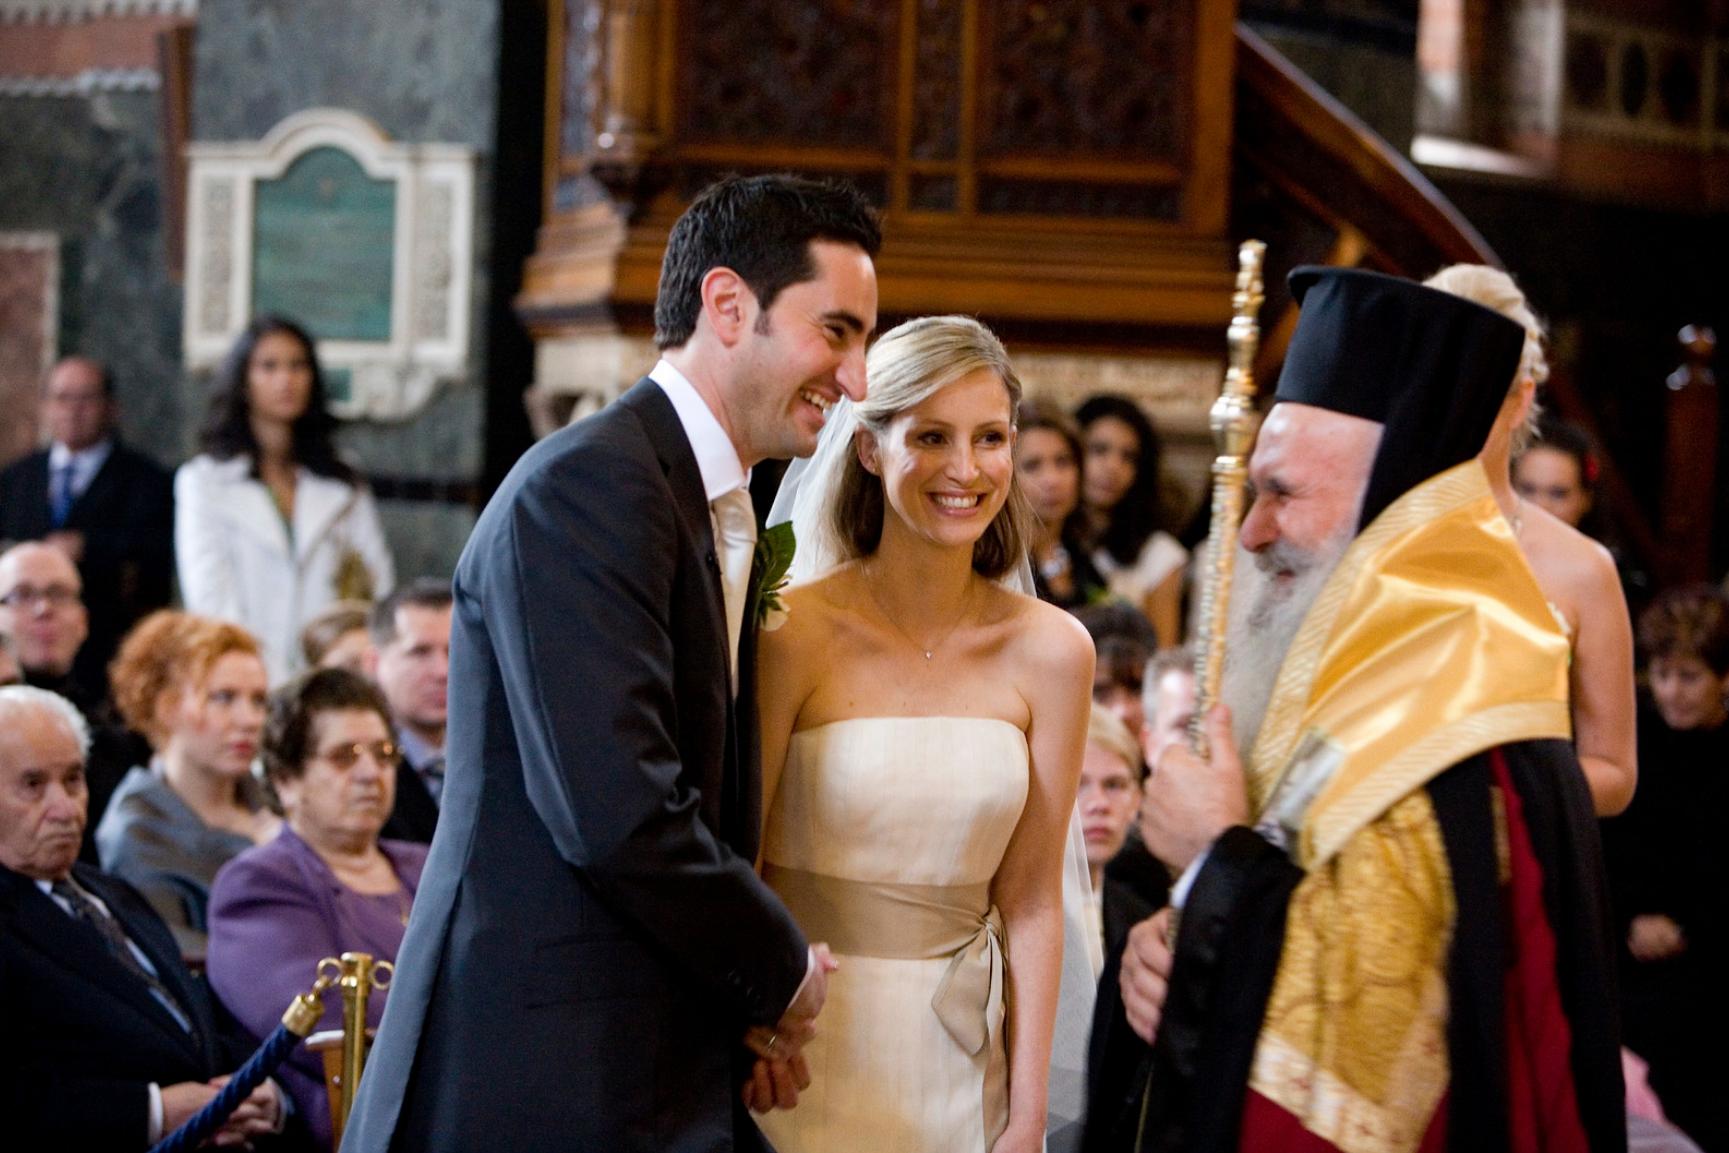 New-York-Portrait-Wedding-Family-Photographer-Tanya-Malott_0200_.PNG